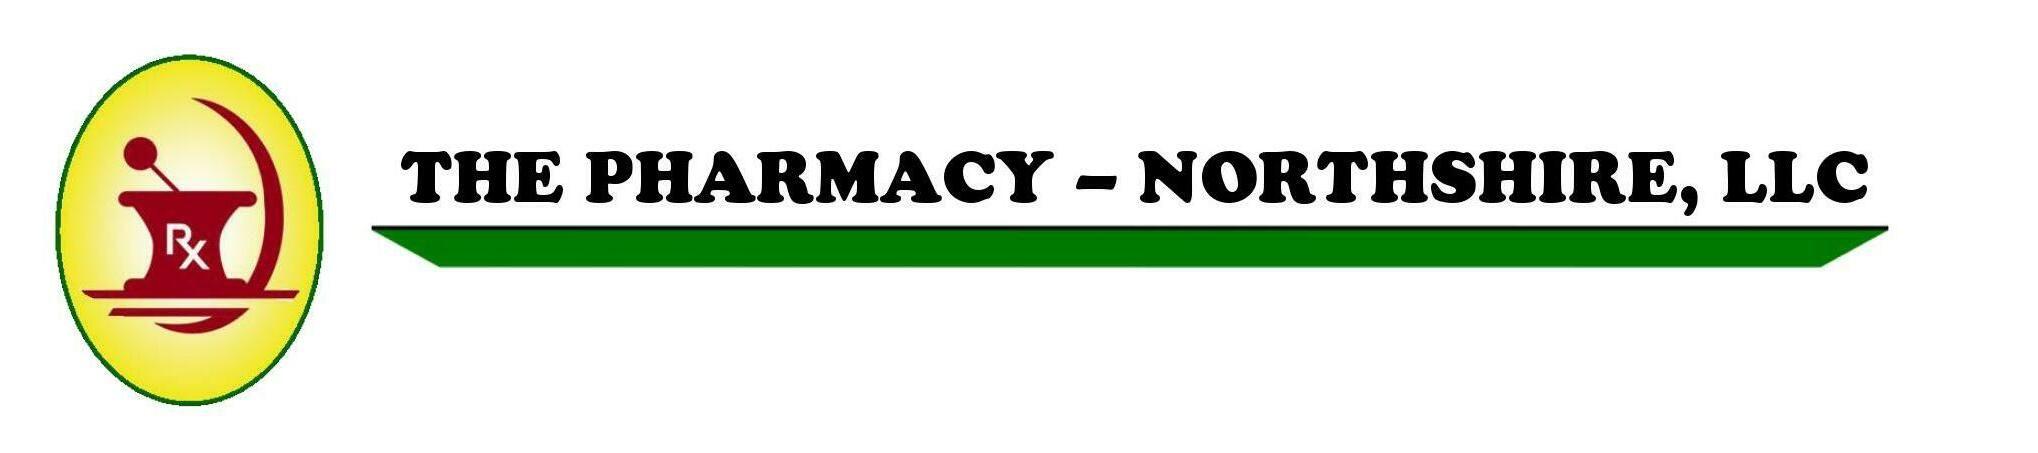 The Pharmacy-Northshire, LLC